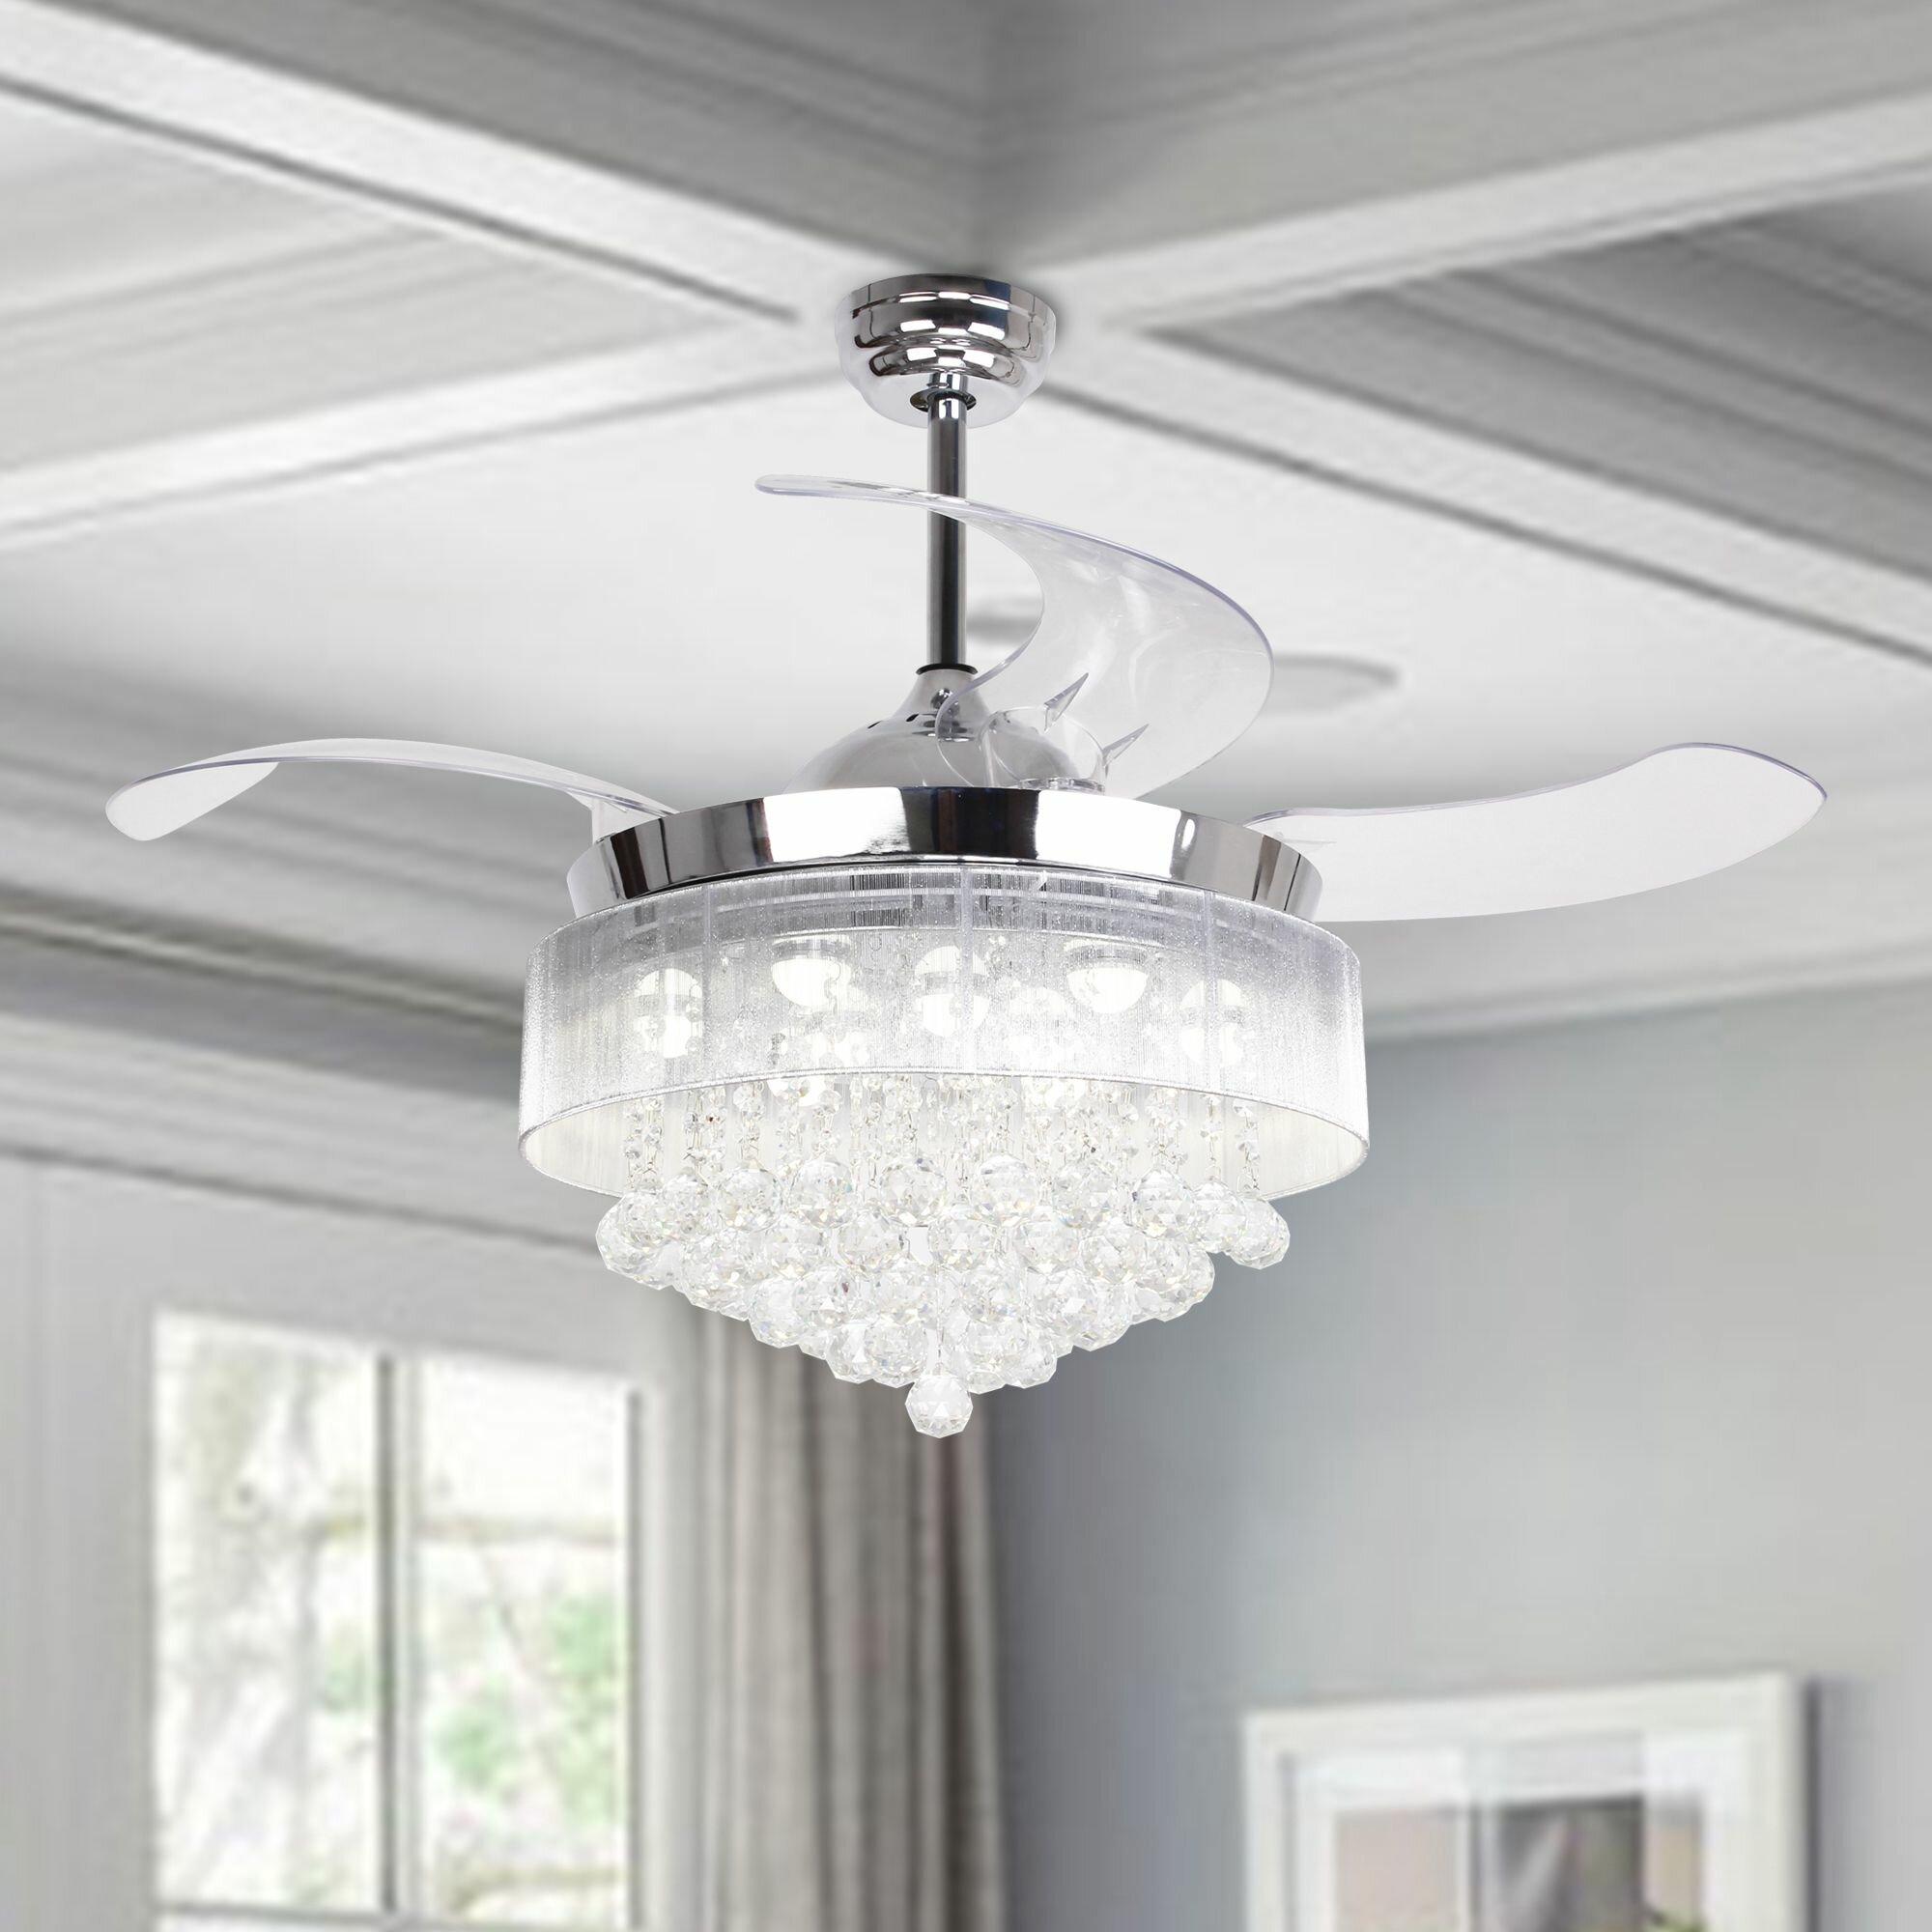 42 5 broxburne 4 blade led ceiling fan with remote